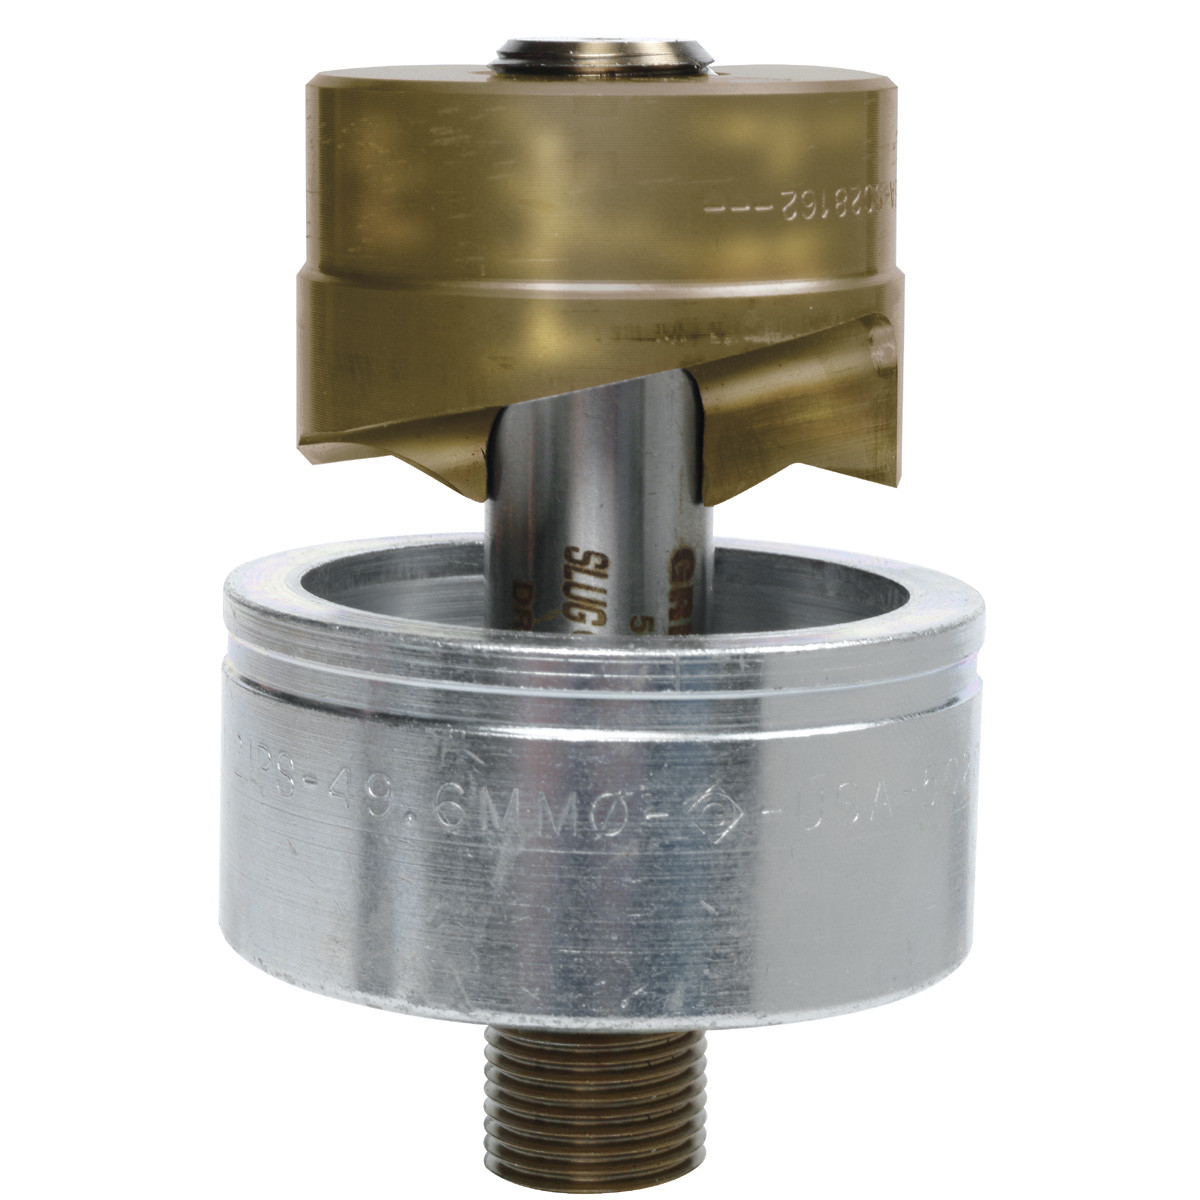 "Greenlee 28154 Slug-Splitter SC Punch 1/2"" Conduit Size"